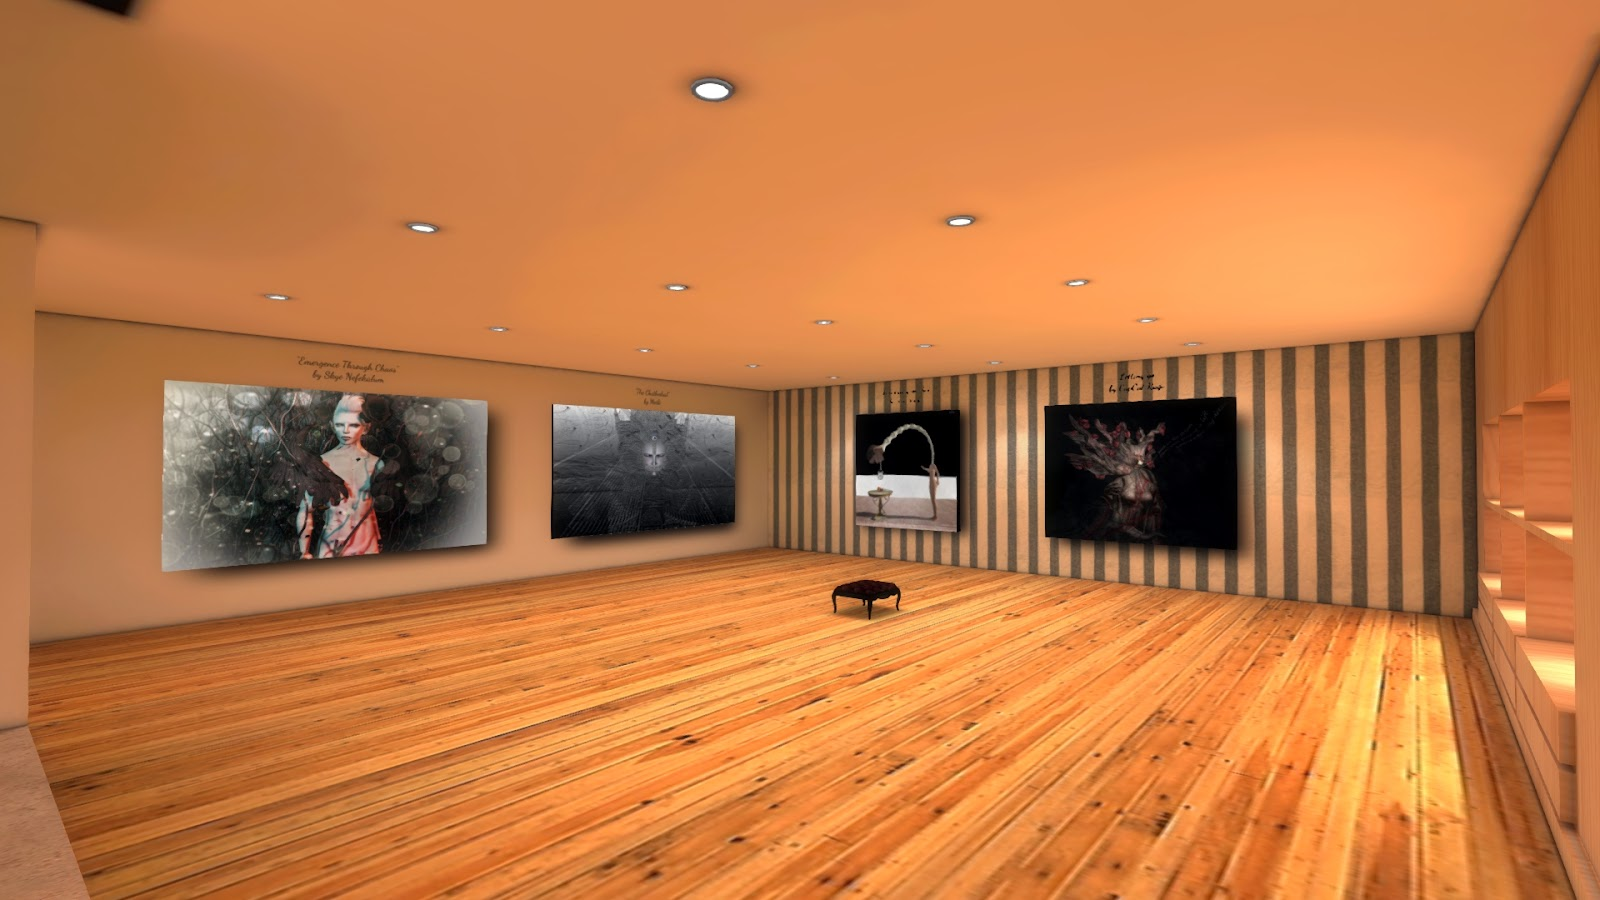 echt virtuell ausstellung surrealism er ffnung 29 mai 2016 21 uhr. Black Bedroom Furniture Sets. Home Design Ideas